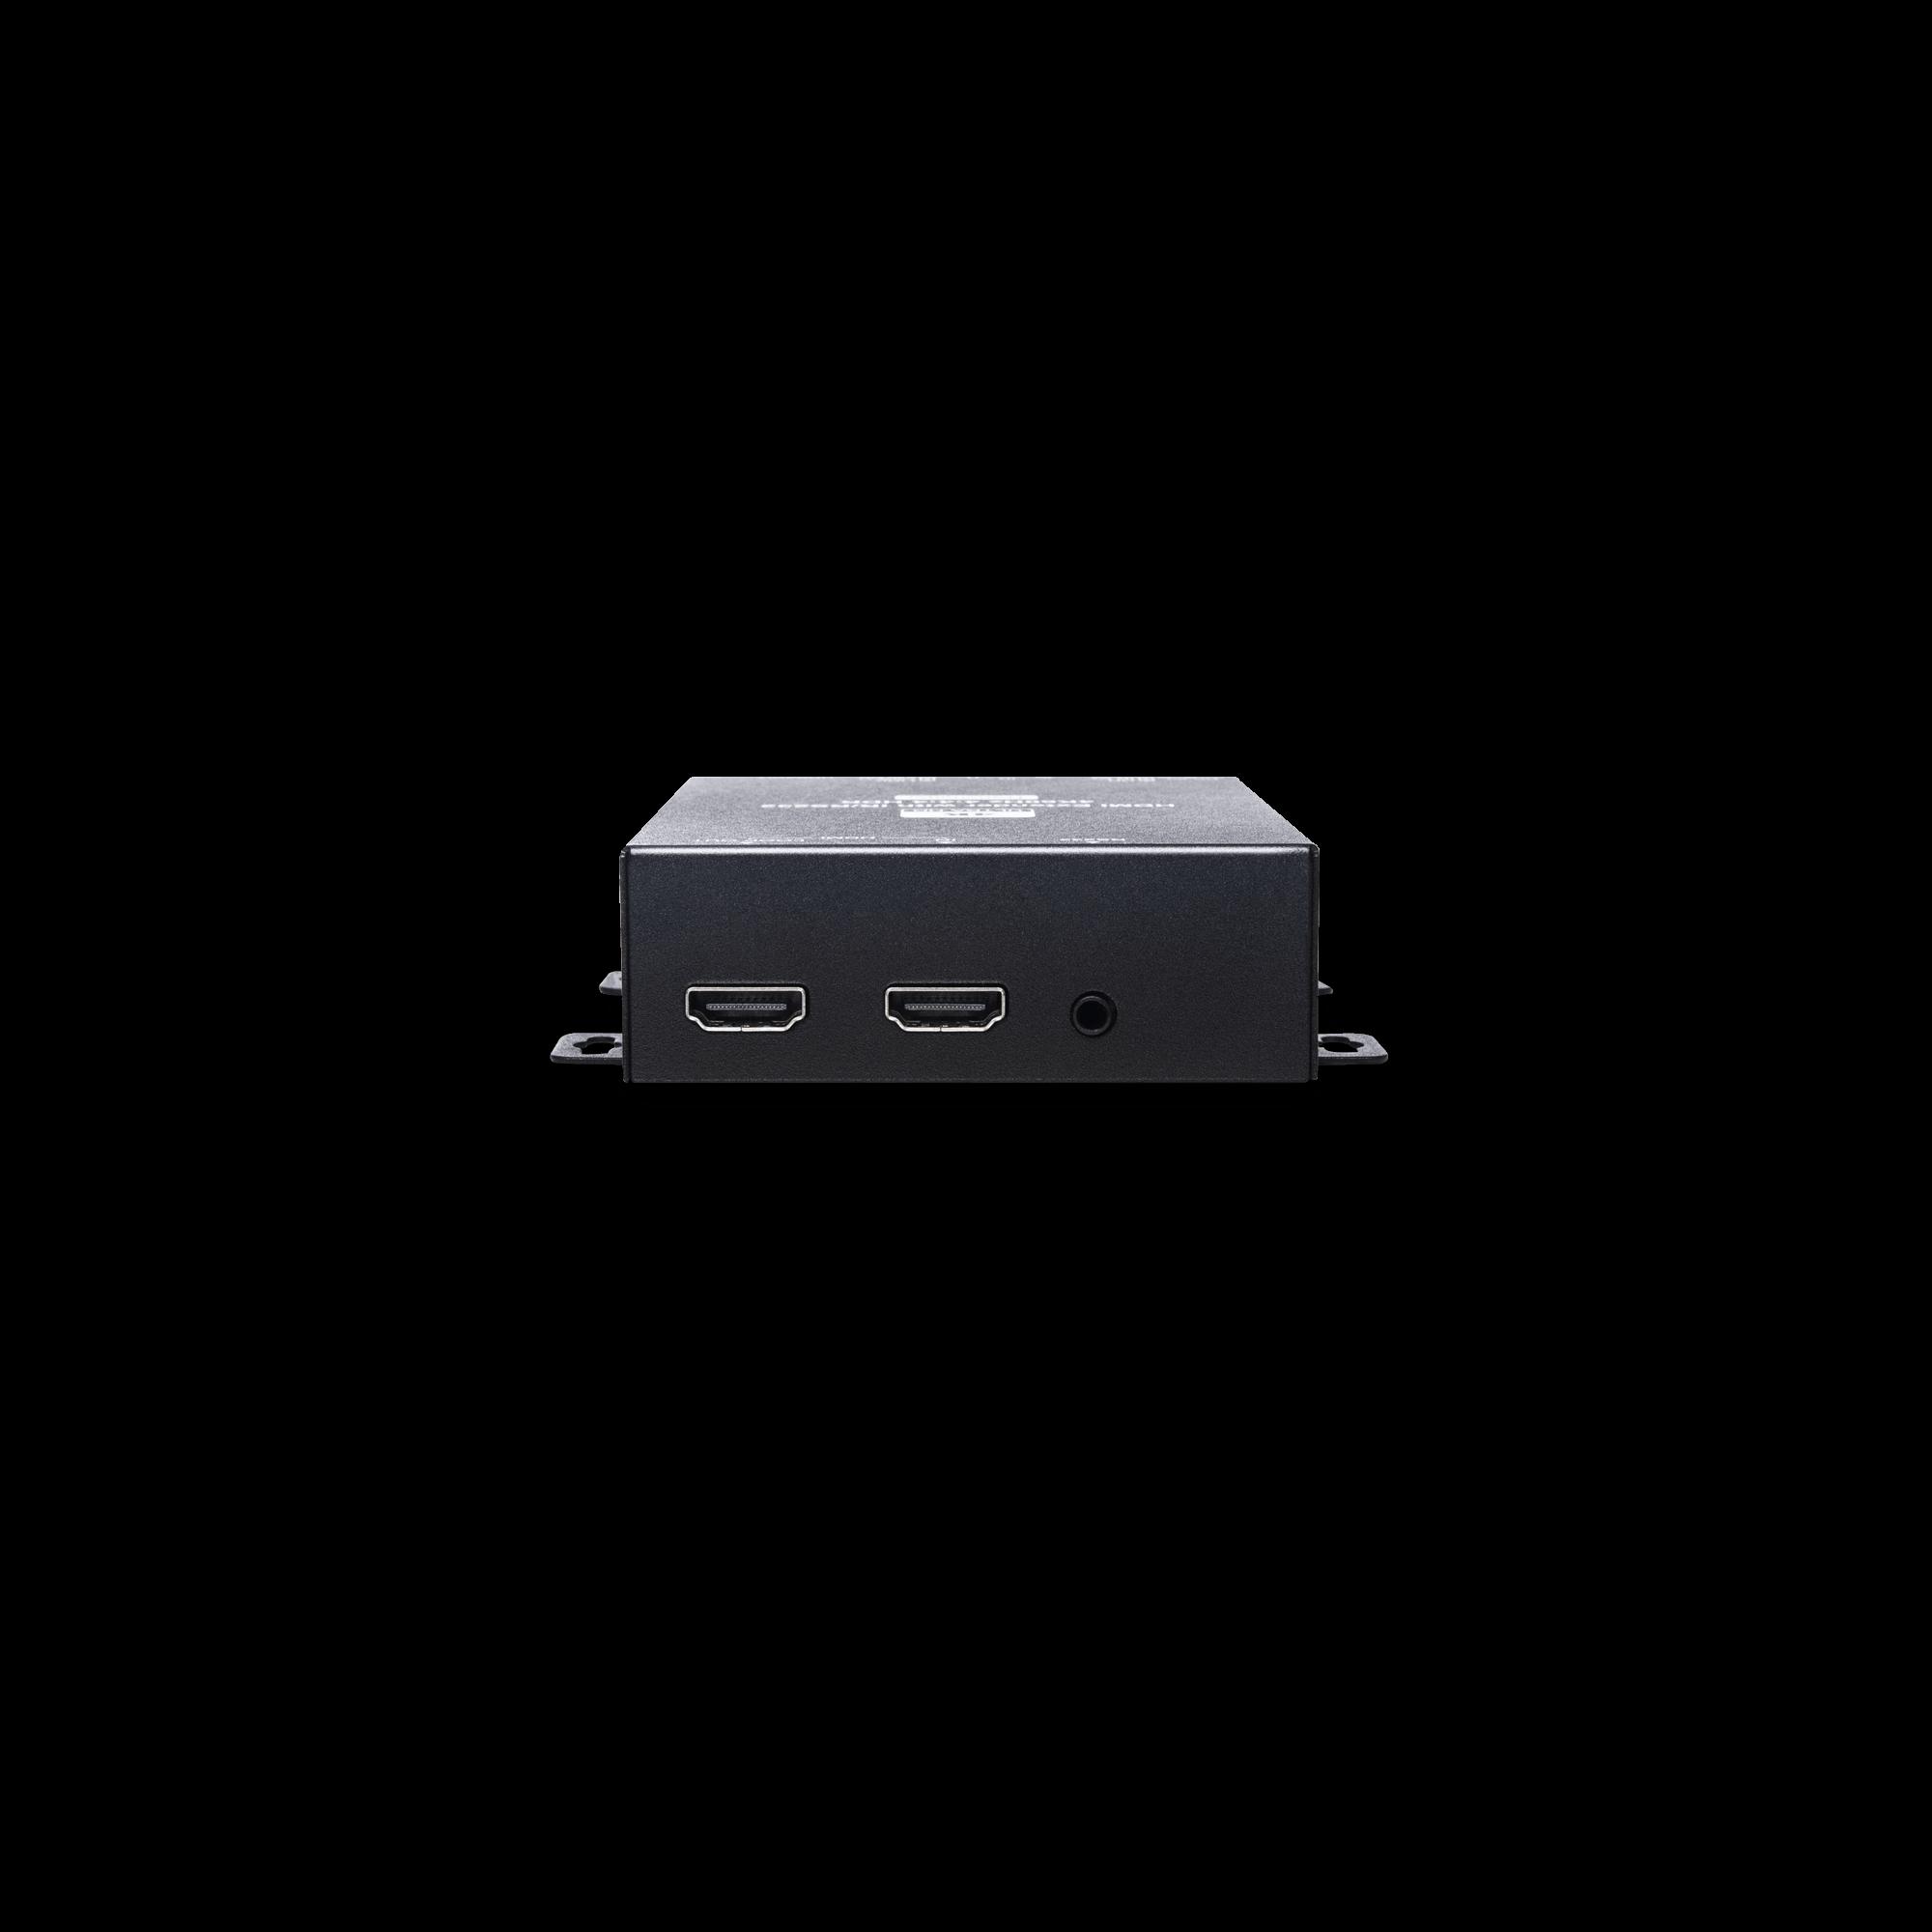 4K 60Hz 4:4:4 HDMI & IR/R232 CAT5e Extender 70M